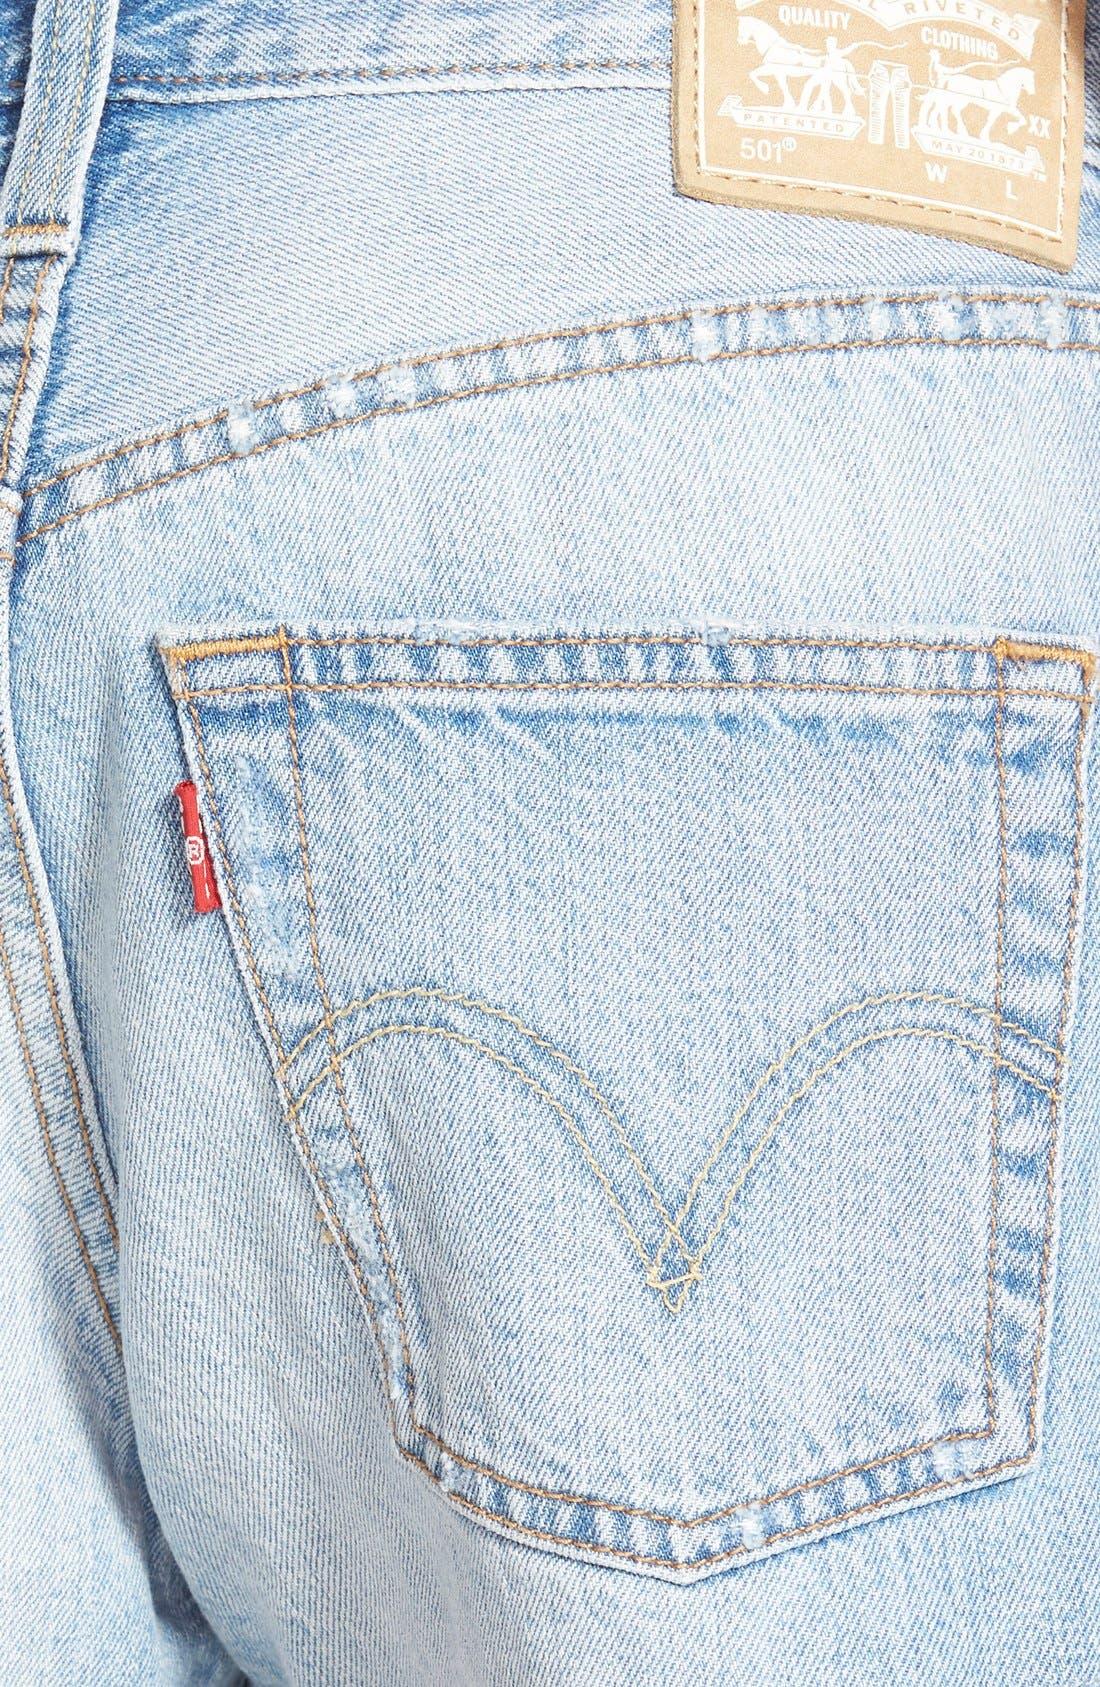 LEVI'S<SUP>®</SUP>, '501<sup>®</sup>' Cutoff Denim Shorts, Alternate thumbnail 2, color, 420